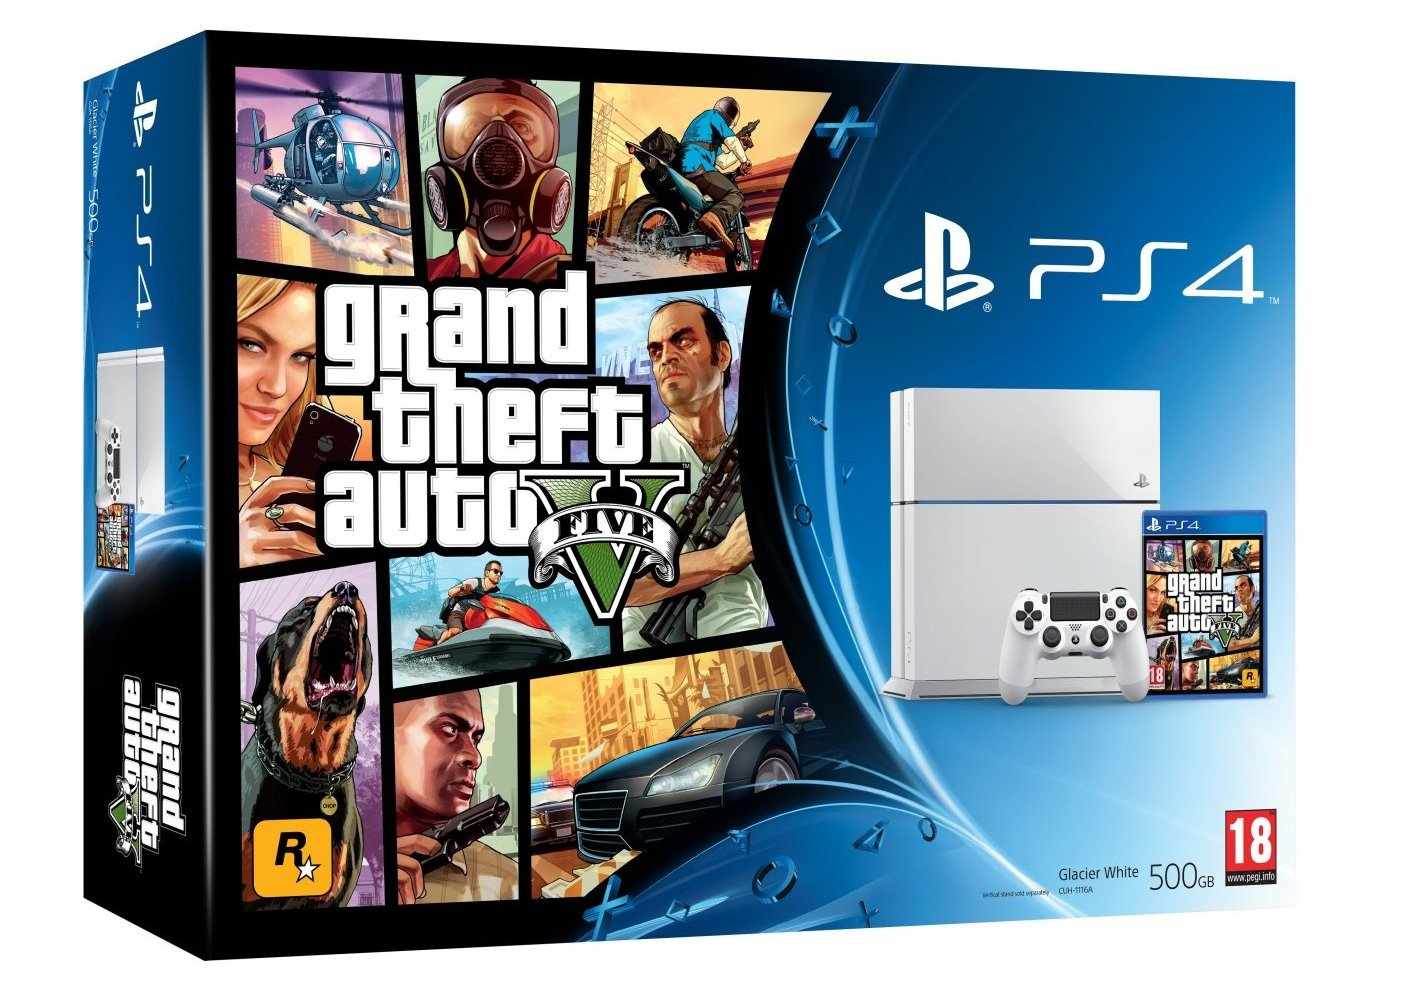 PlayStation 4 500 GB Grand Theft Auto V Bundle Glacier White